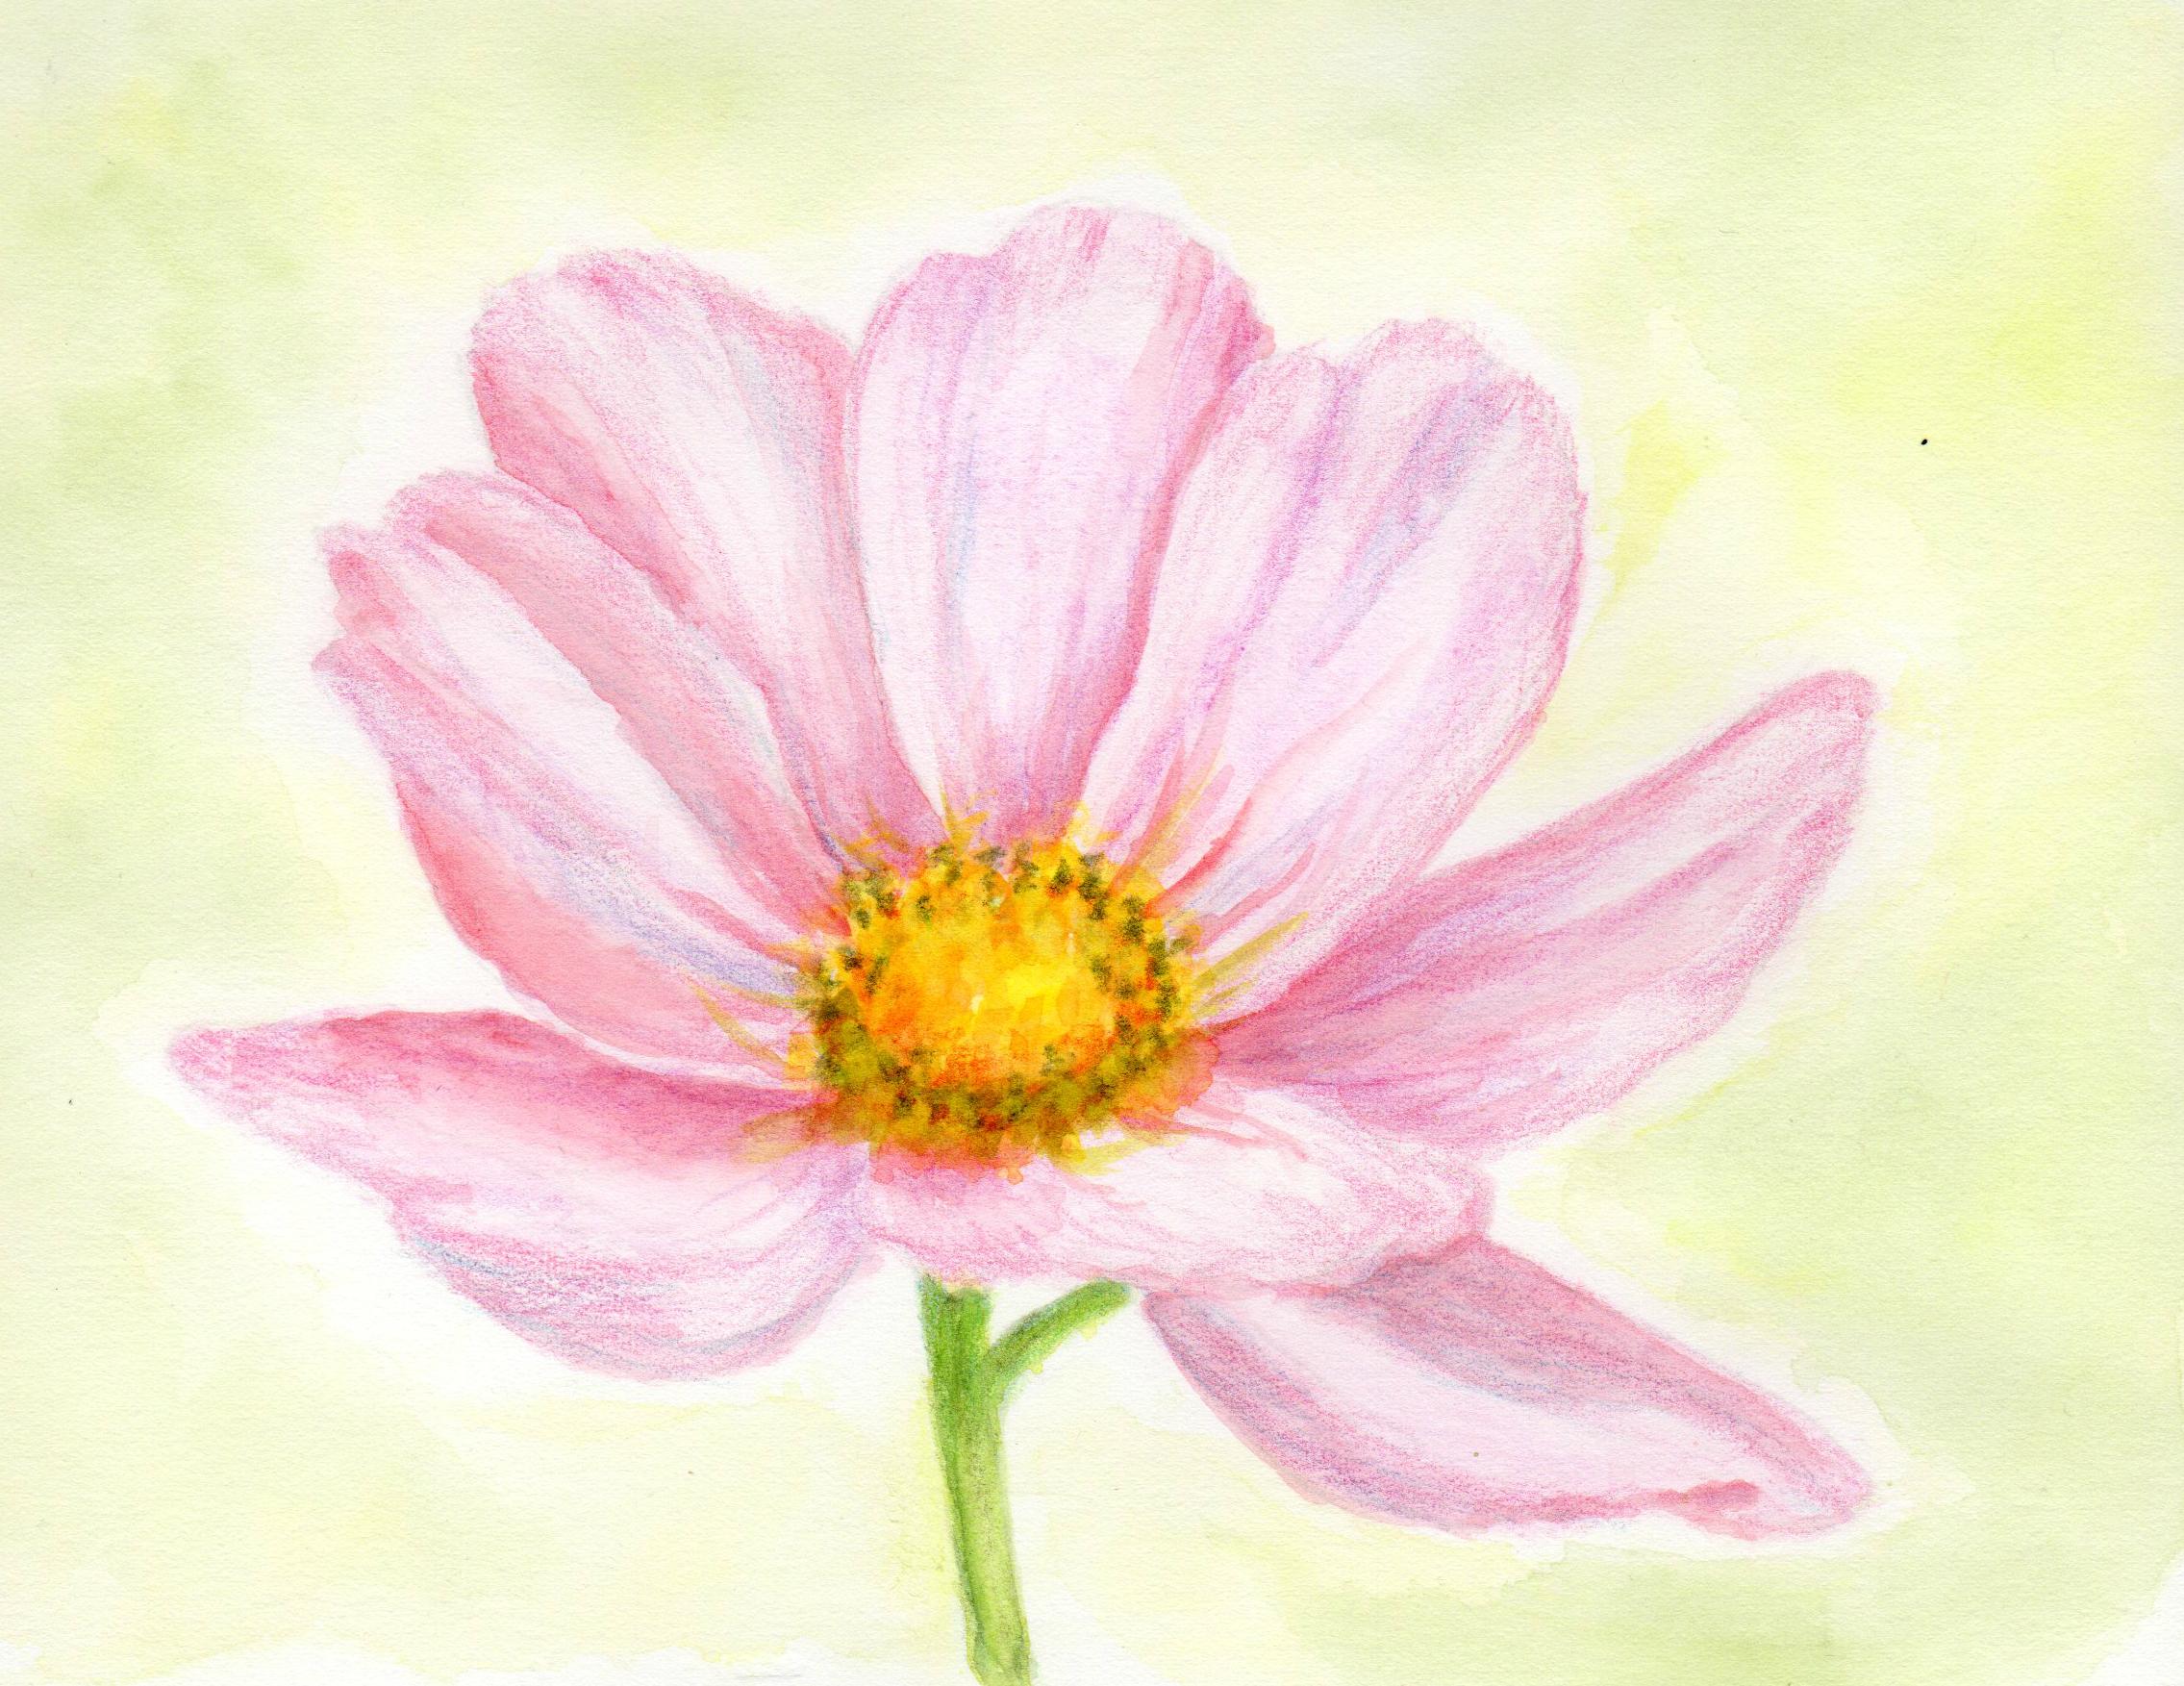 Cosmos Floral by Elizabeth Oertel